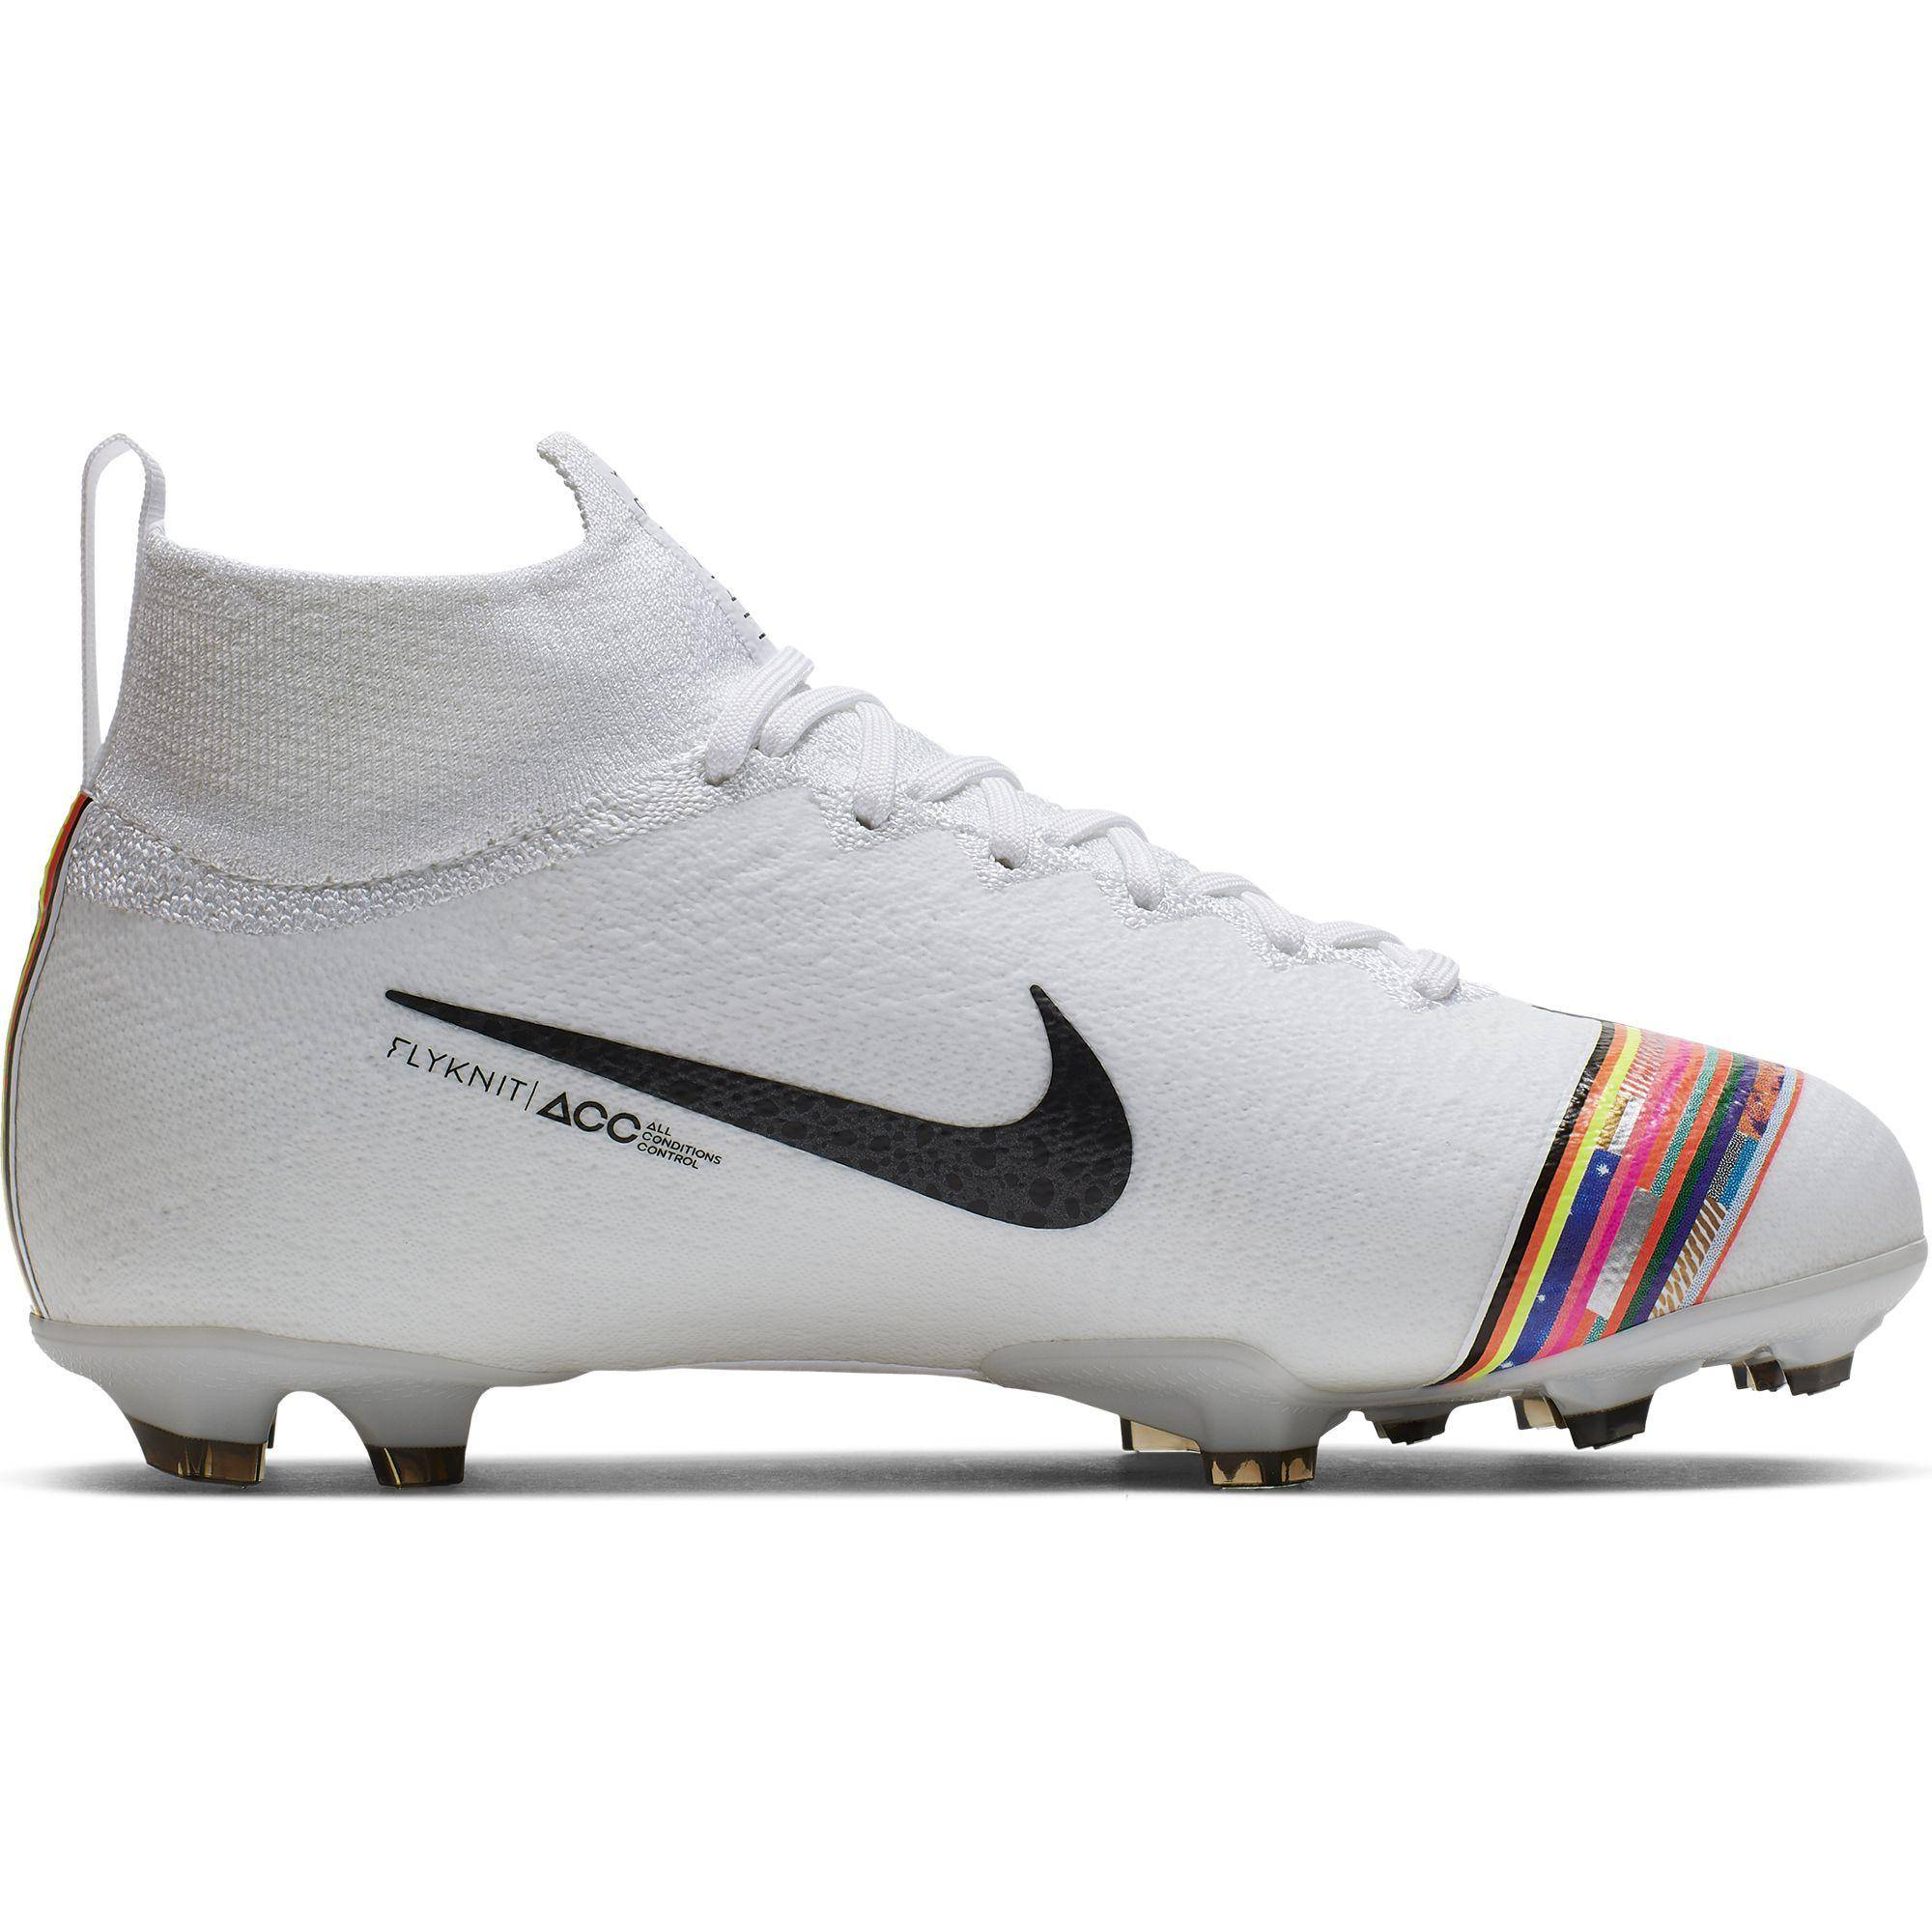 Nike Superfly 6 Elite CR7 FG Nike Enfant Cristiano Ronaldo Continuativa